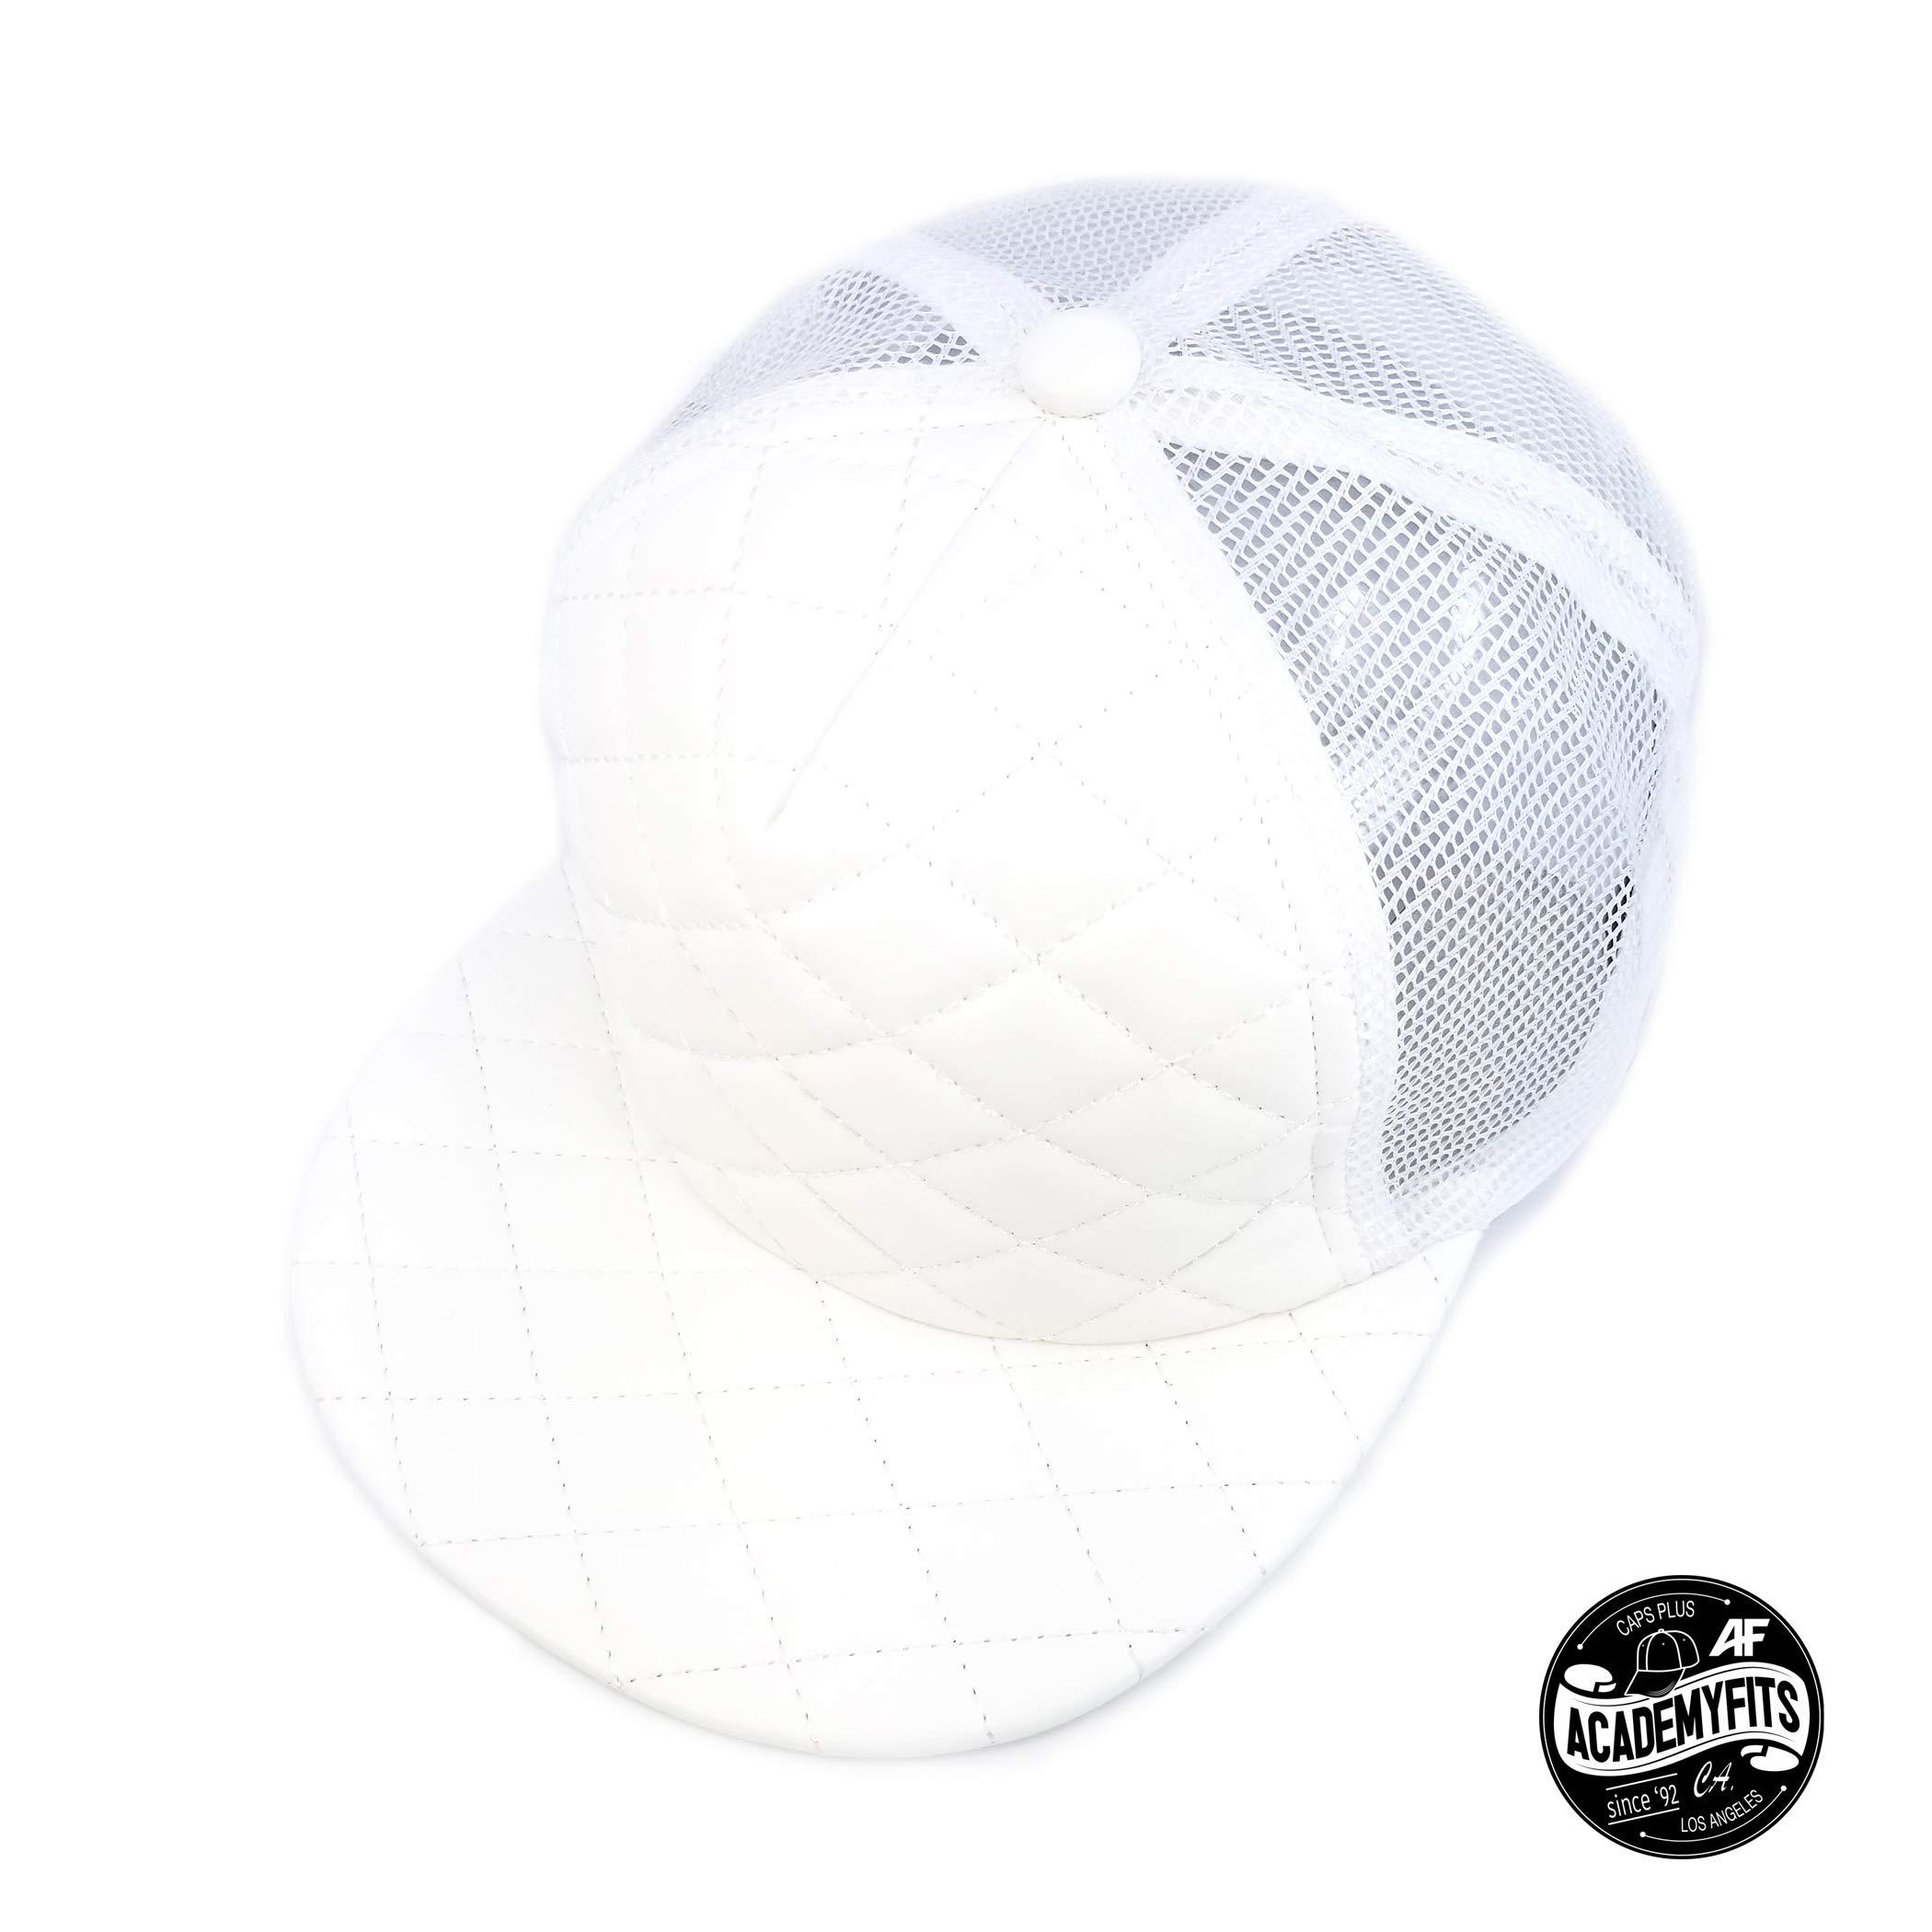 AcademyFits Quality 5 Panel High Crown Foam Quilted Trucker Mesh Snapback Adjustable Fit Men Women Unisex Flat Visor Baseball Hat Cap (White)